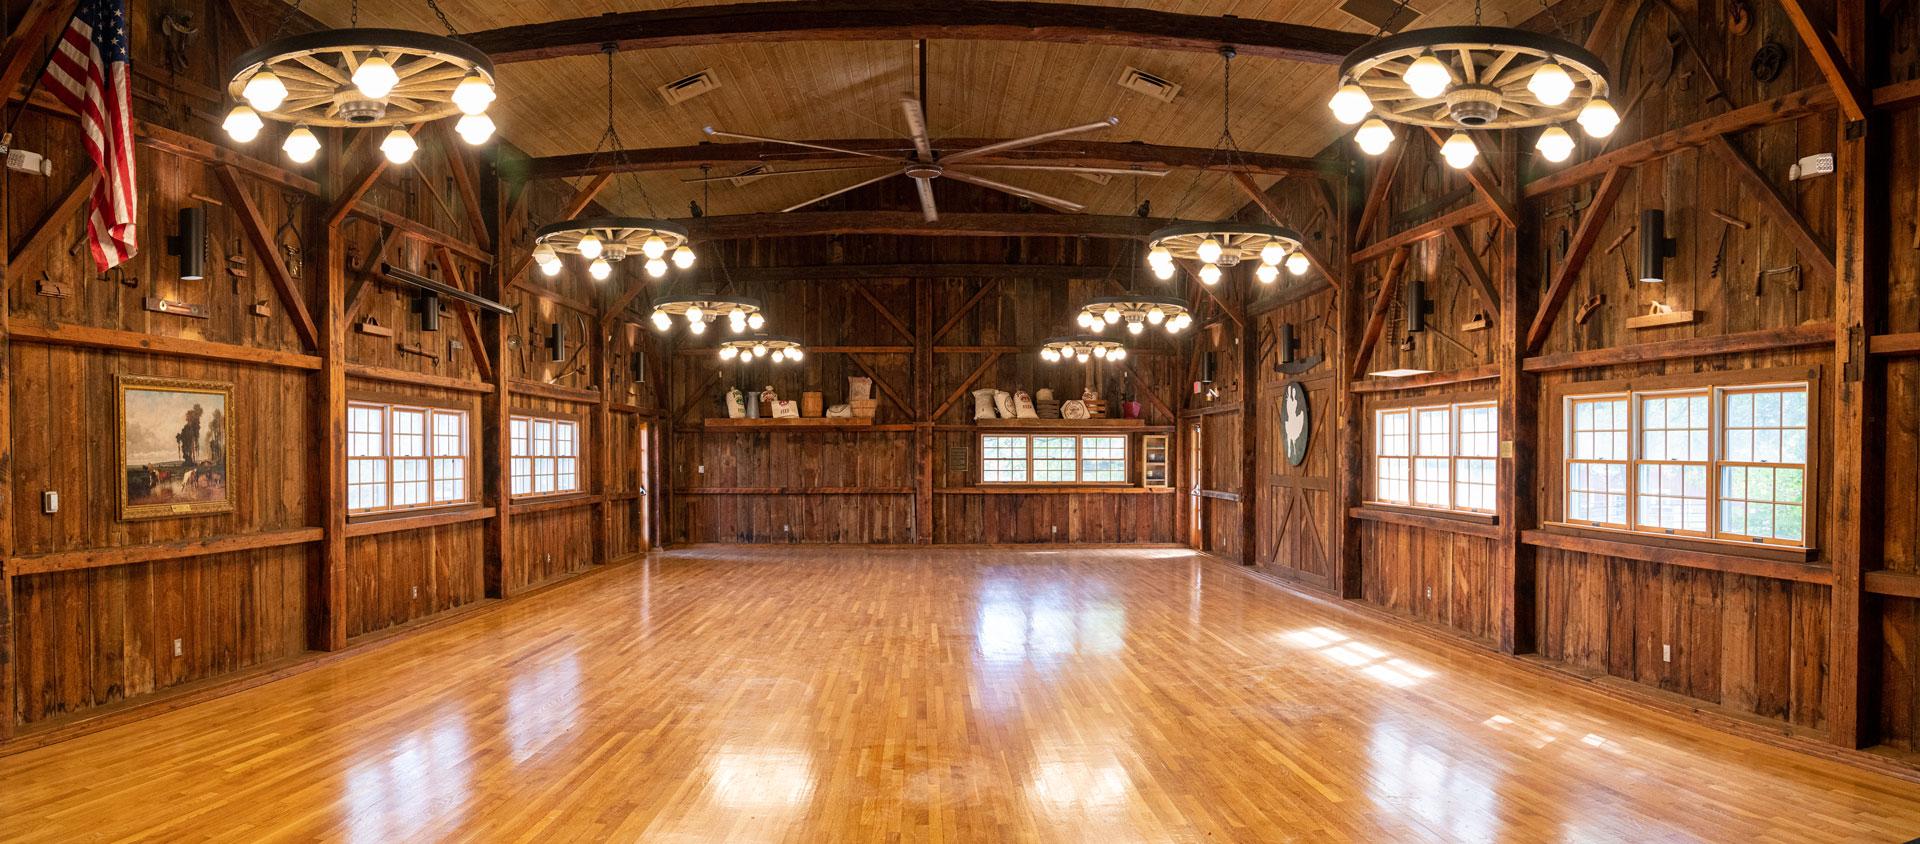 Hayloft Barn interior